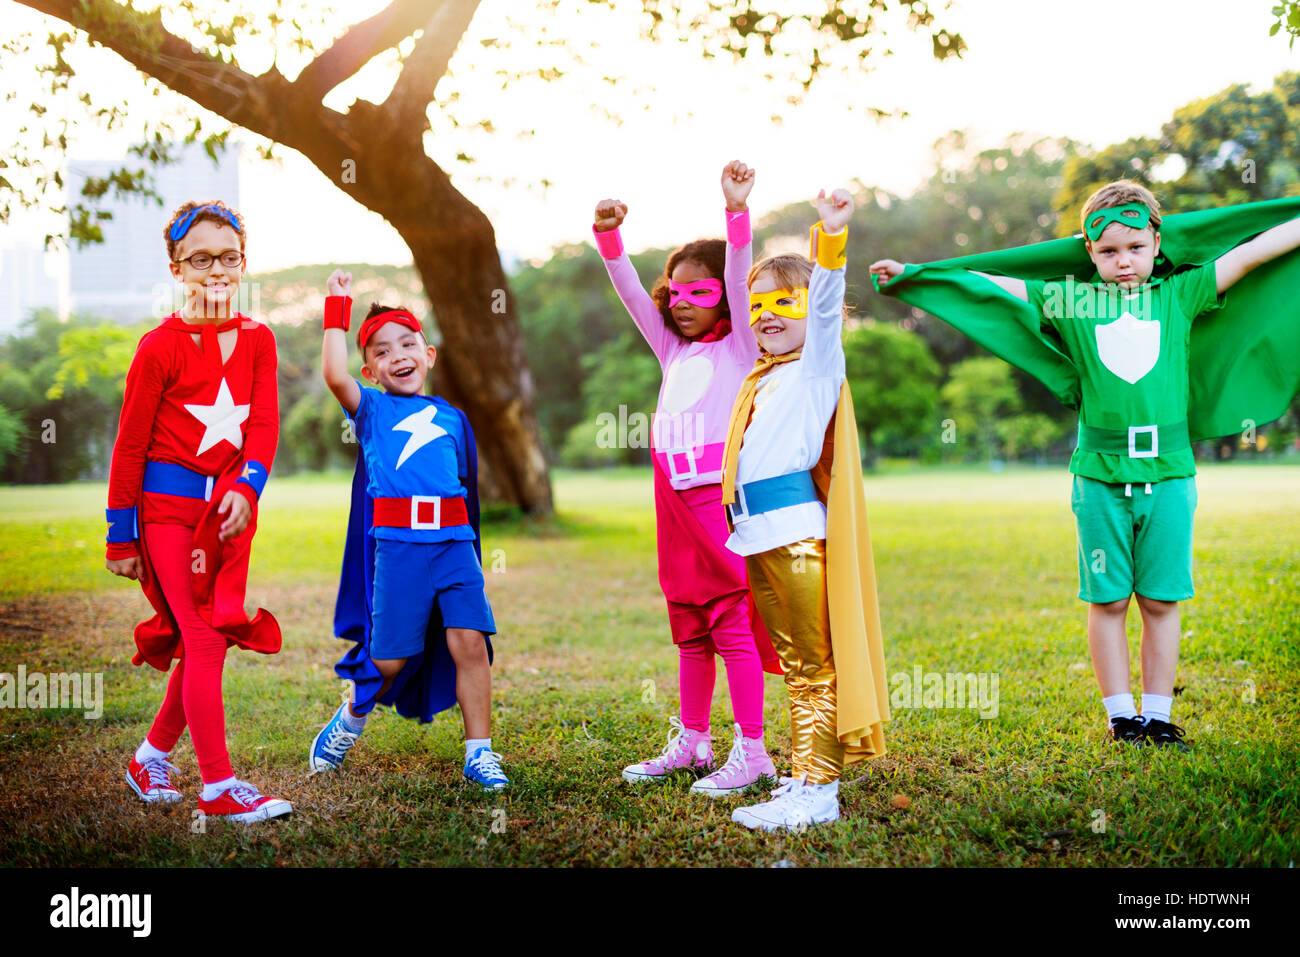 Super Kids Play Ground Concept Stock Photo: 129010157 - Alamy